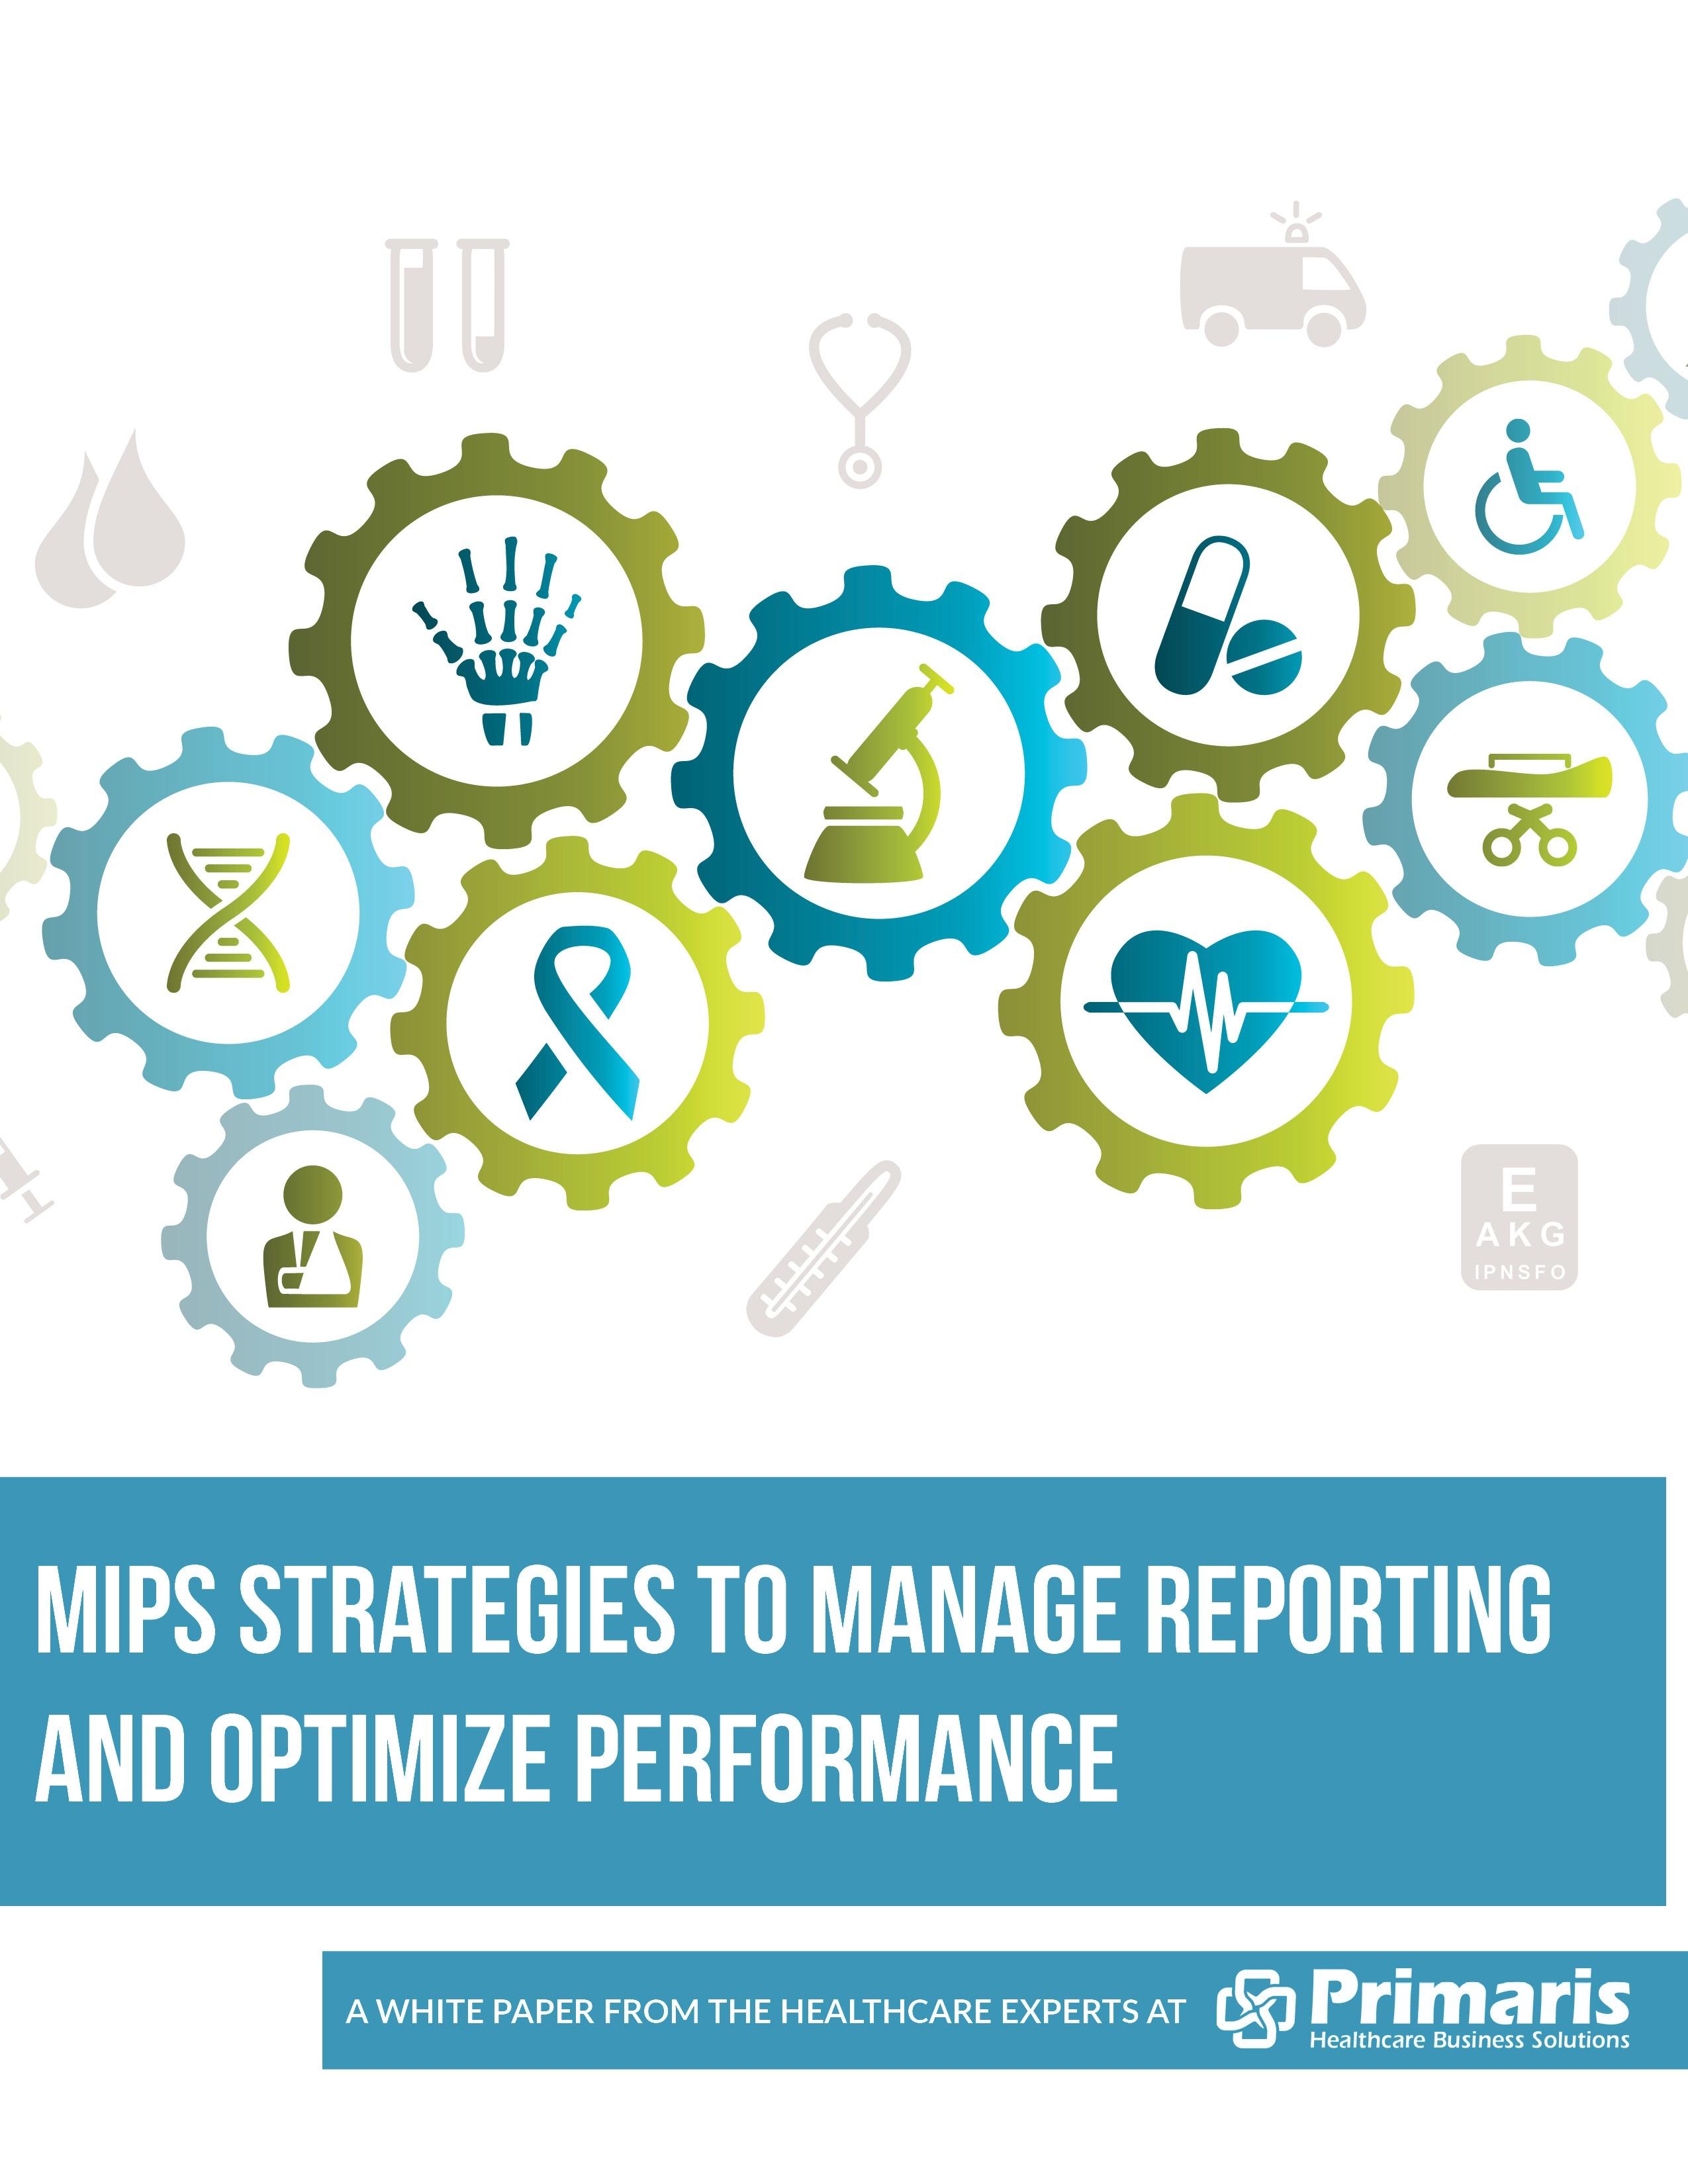 17-207-MK MIPS Campaign WHITE PAPER.jpg